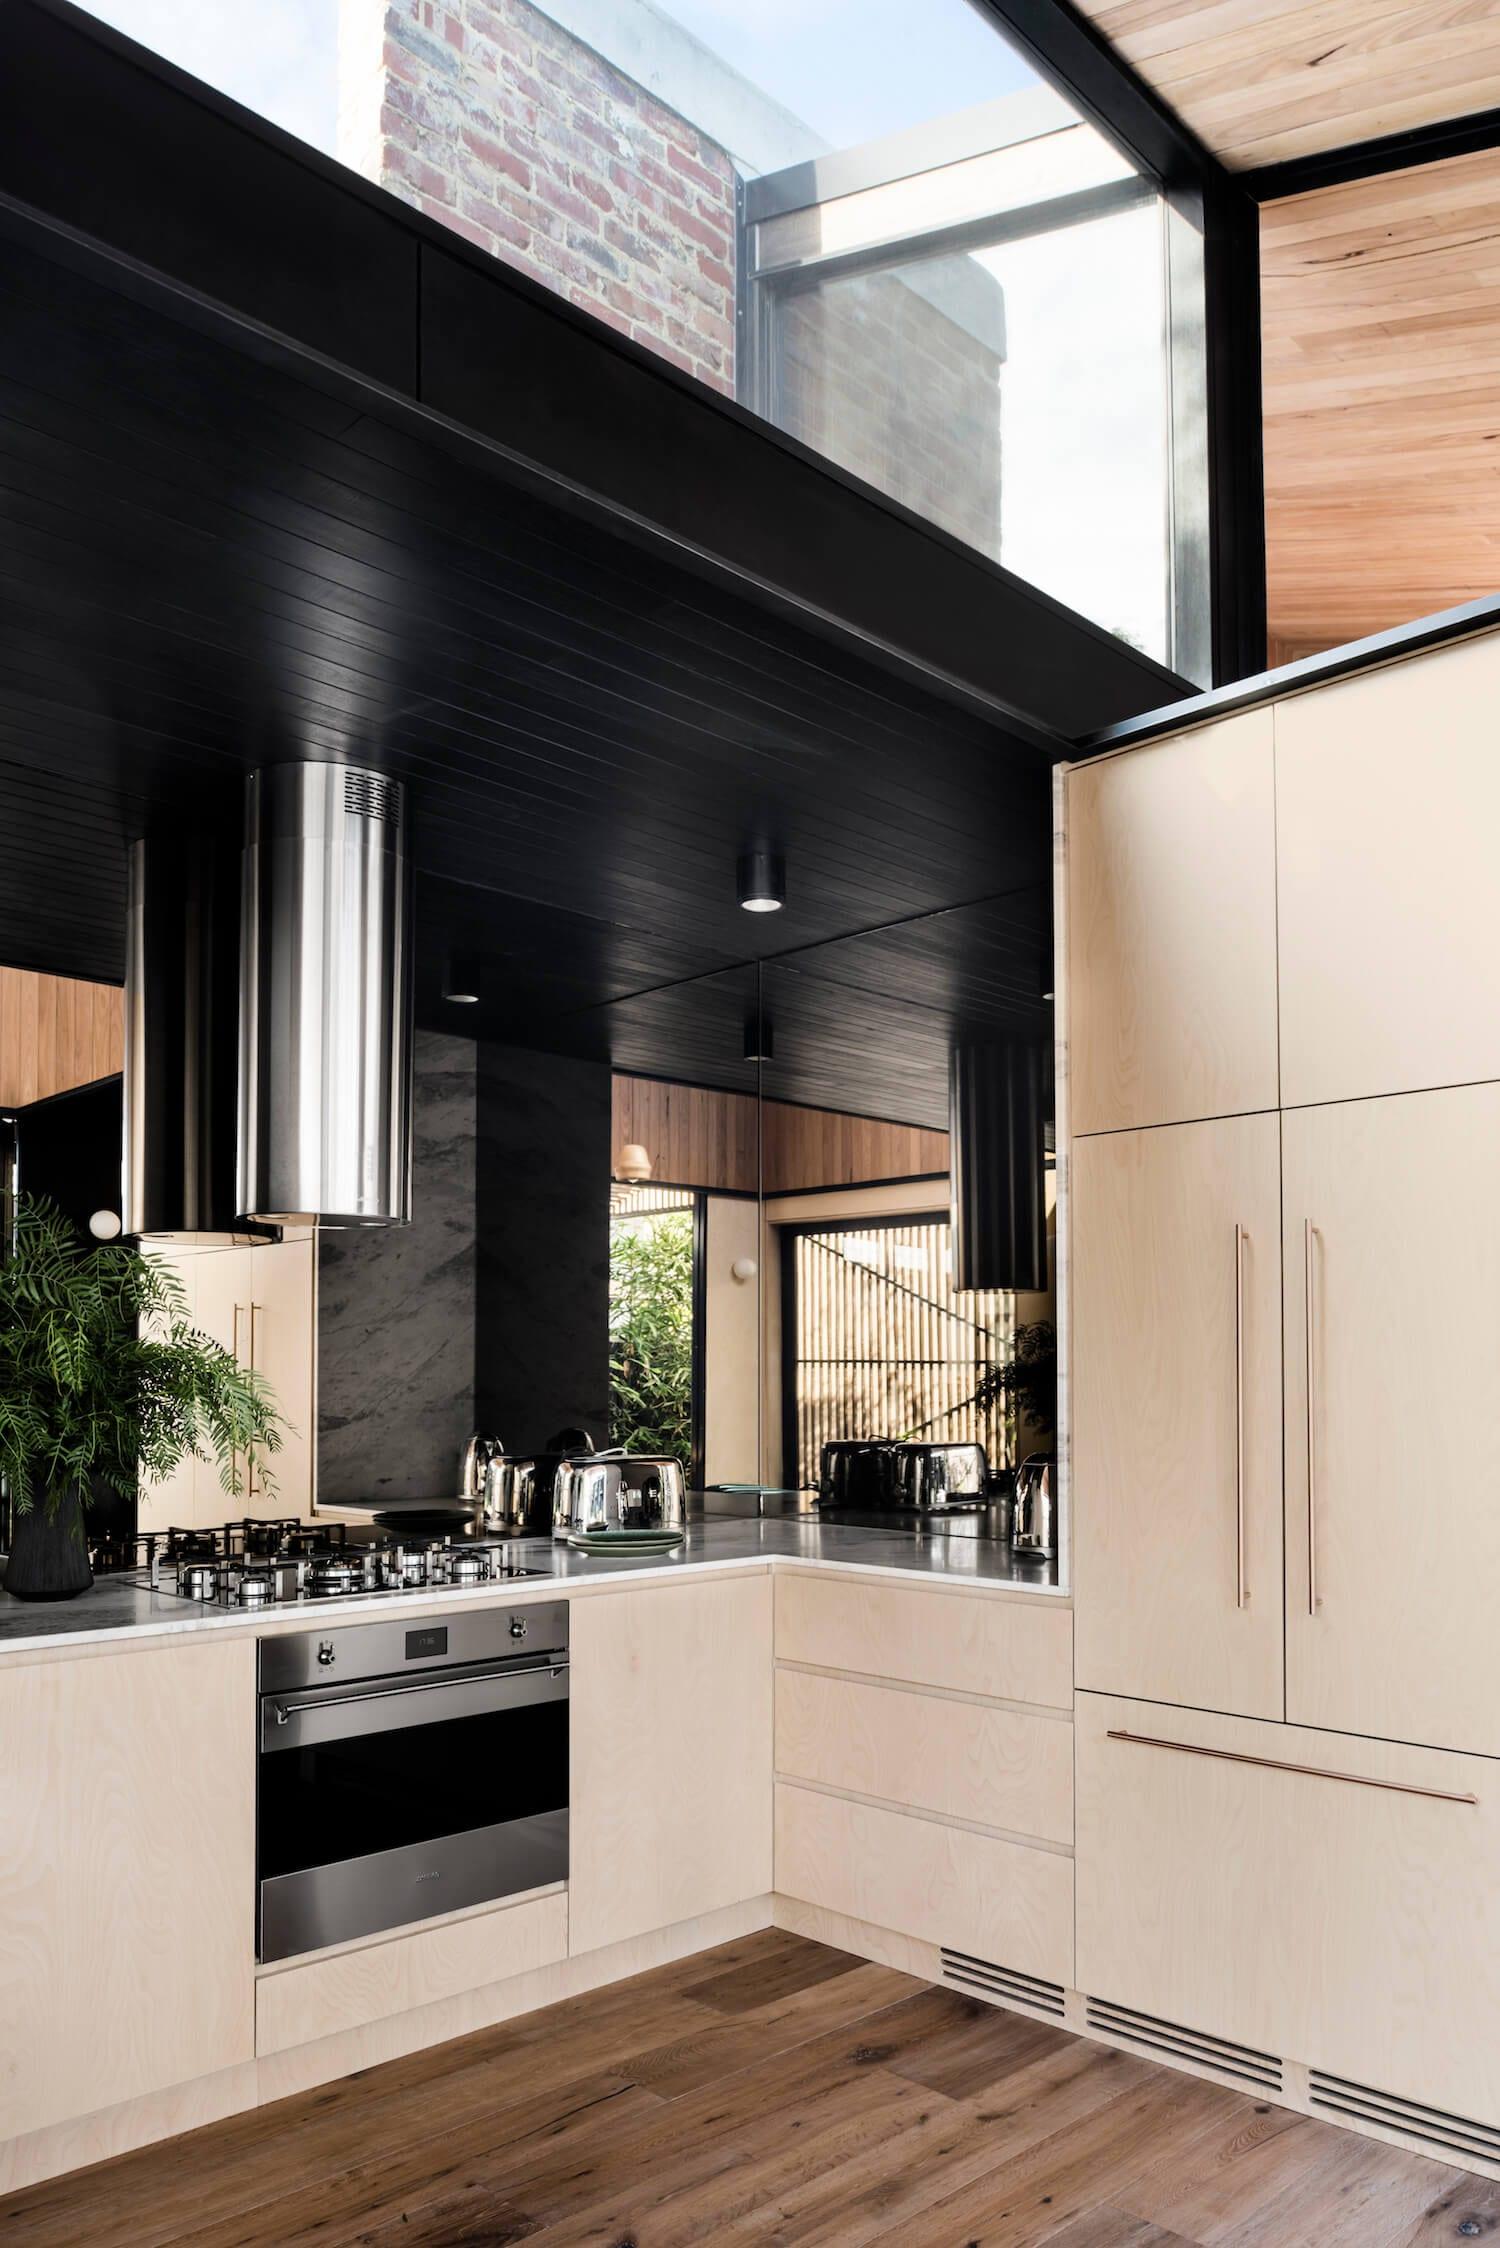 Smeg Classic in Light Corridor House by FIGR Architecture & Designm   Yellowtrace